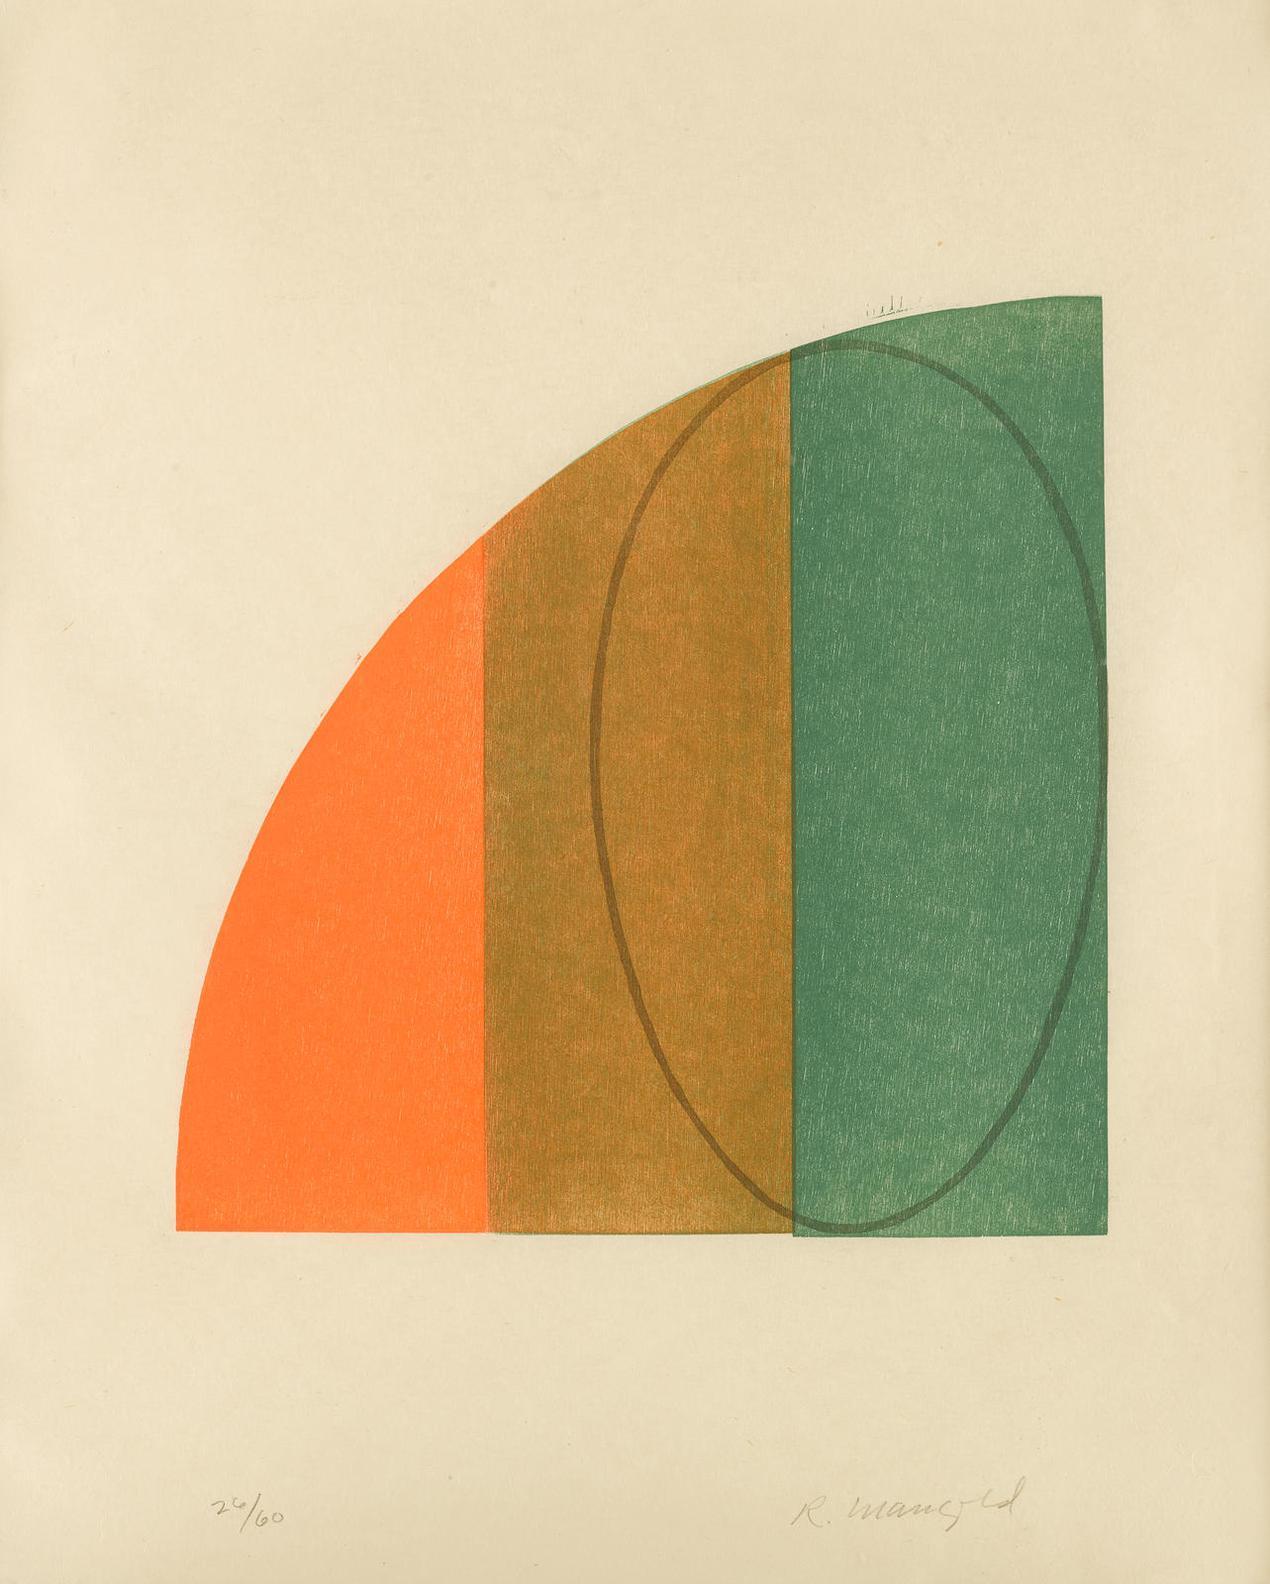 Robert Mangold-Curved Plane/Figure #Ii; Curved Plane/Figure #III-1995